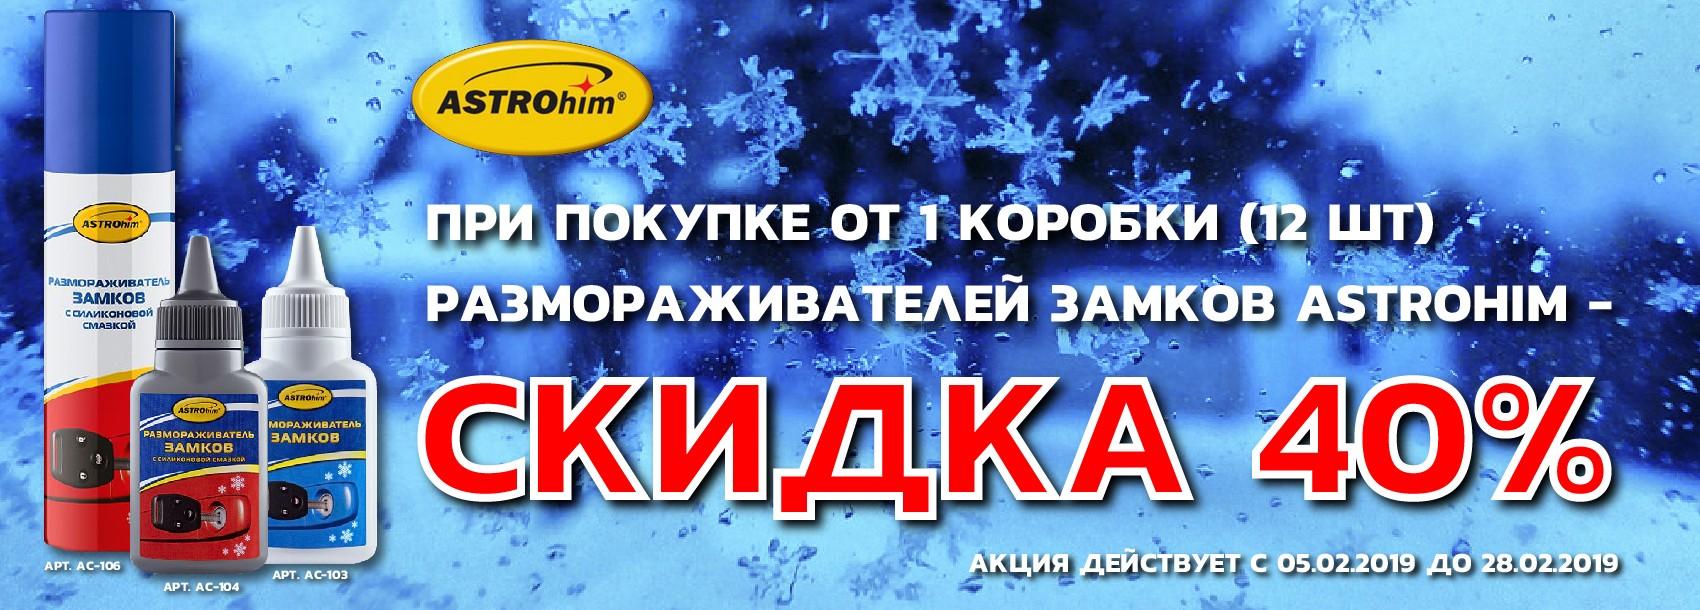 Акция 'Скидка 40% на размораживатели замков ASTROhim'